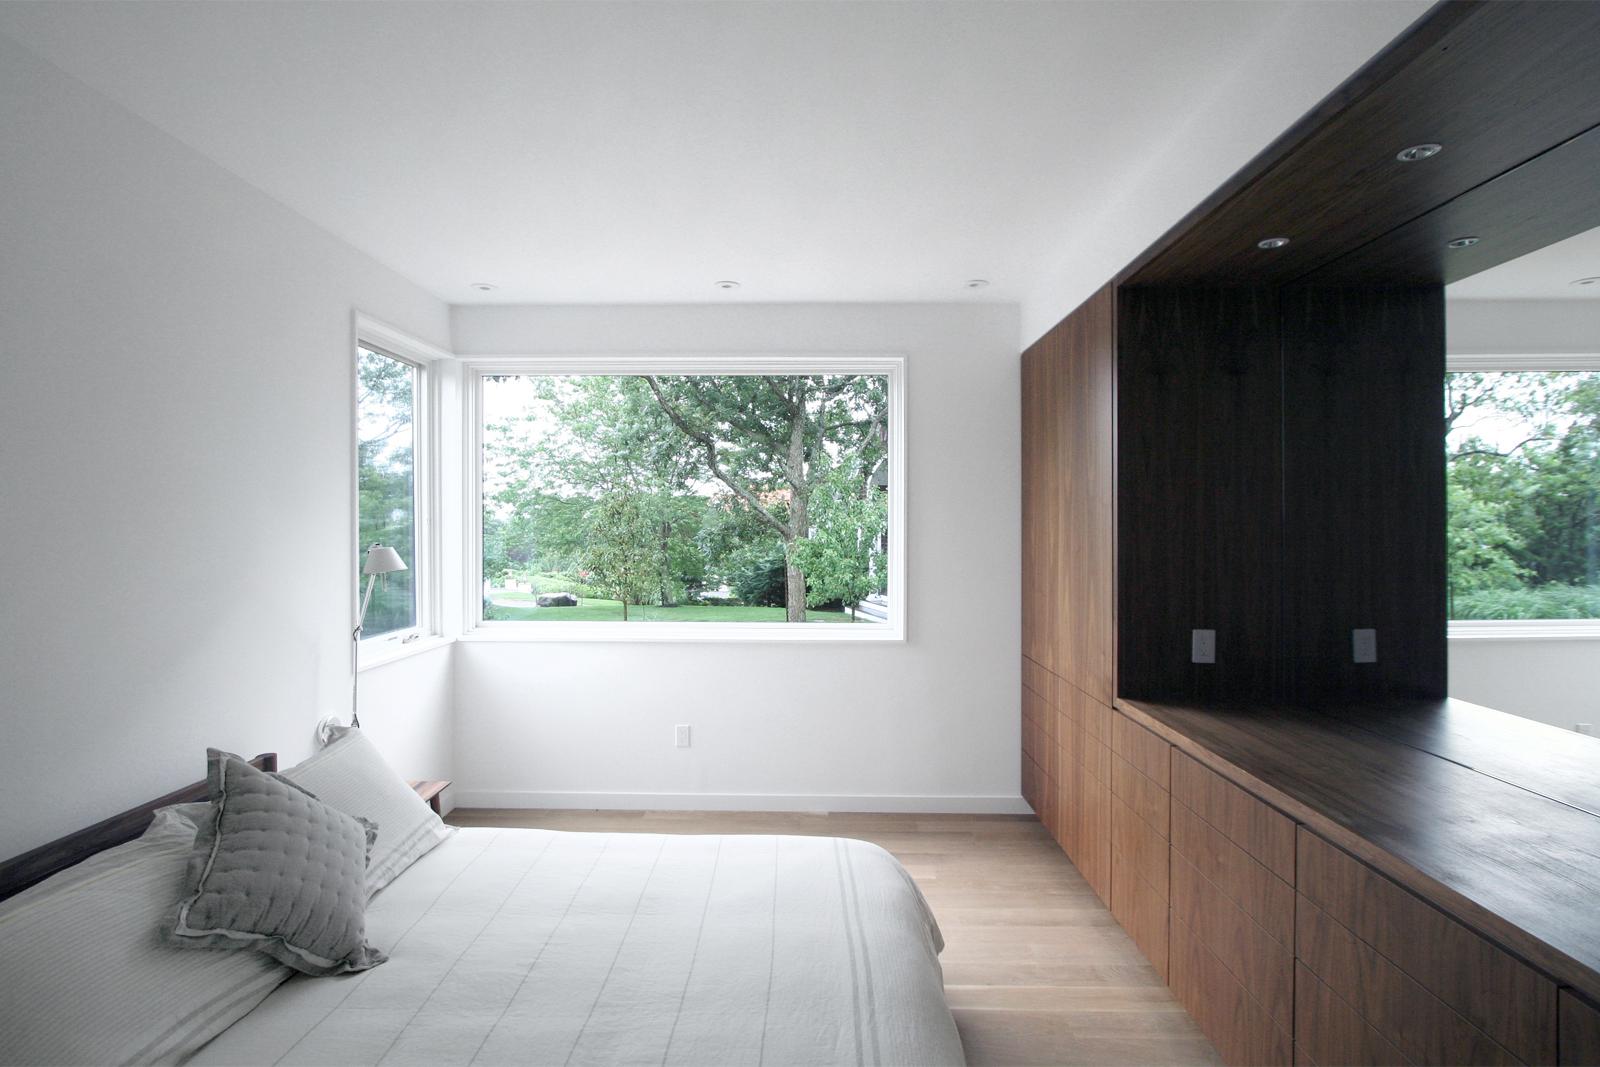 20-res4-resolution-4-architecture-modern-modular-house-prefab-home-north-fork-bluff-house-interior-bedroom-millwork.jpg